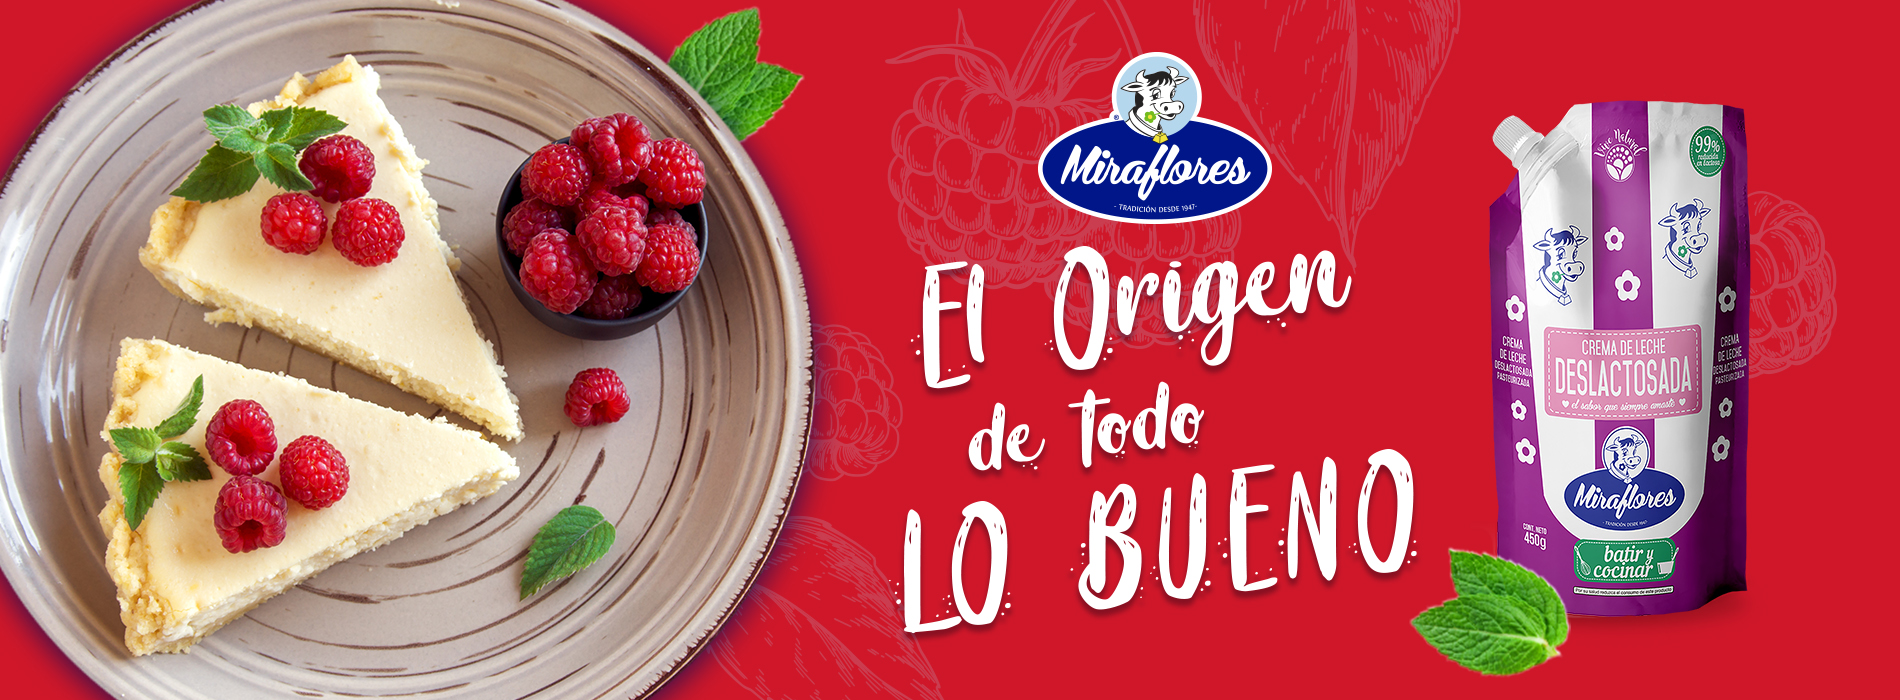 Productos Miraflores, yogurt, mantequilla, crema de leche